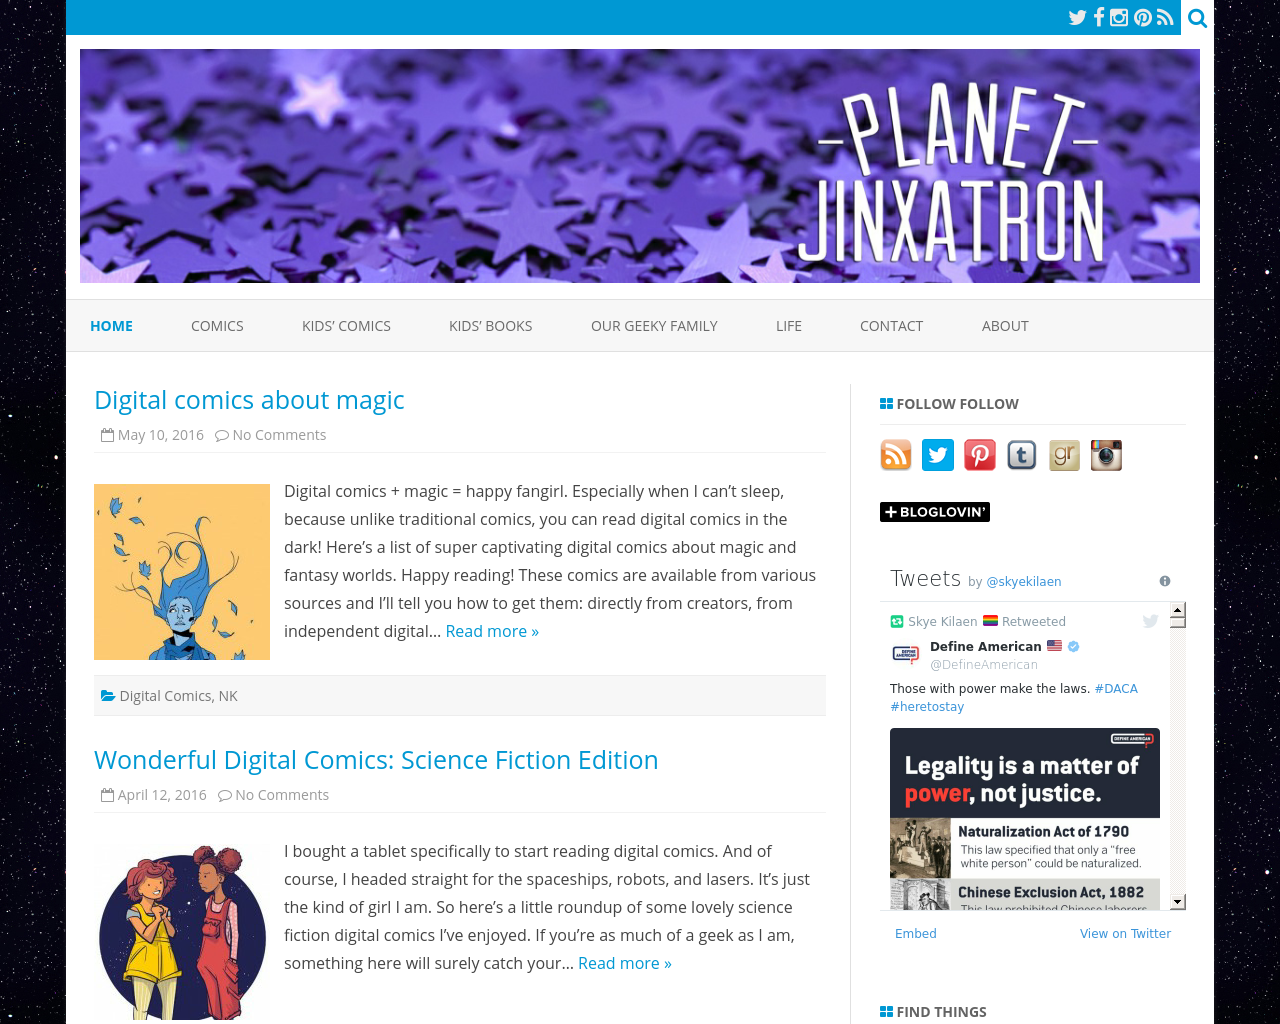 Planet-Jinxatron-Advertising-Reviews-Pricing